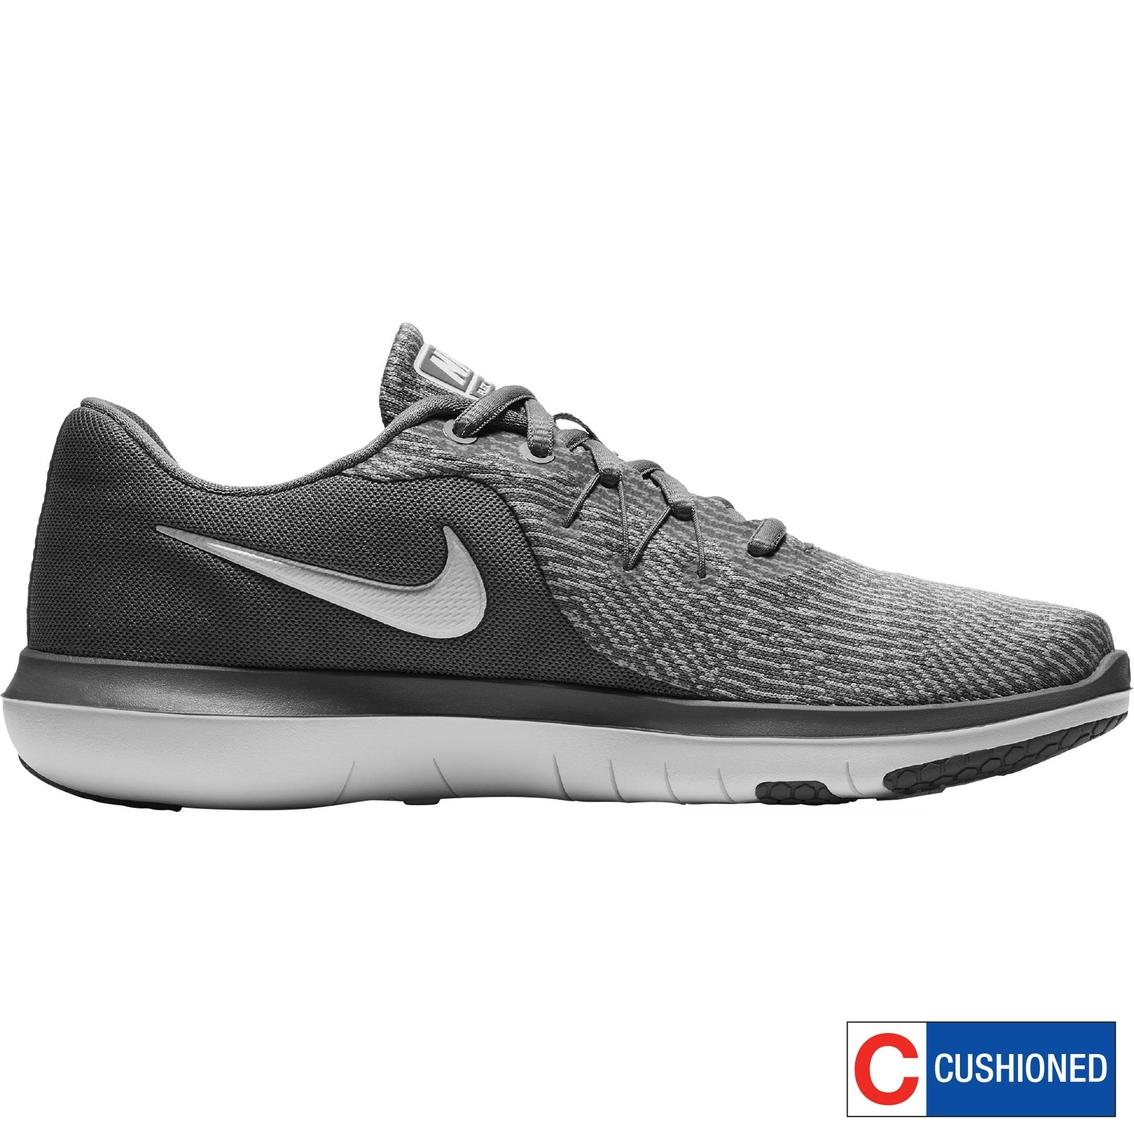 1111af856f1e Nike Flex Supreme Tr 6 Training Shoes